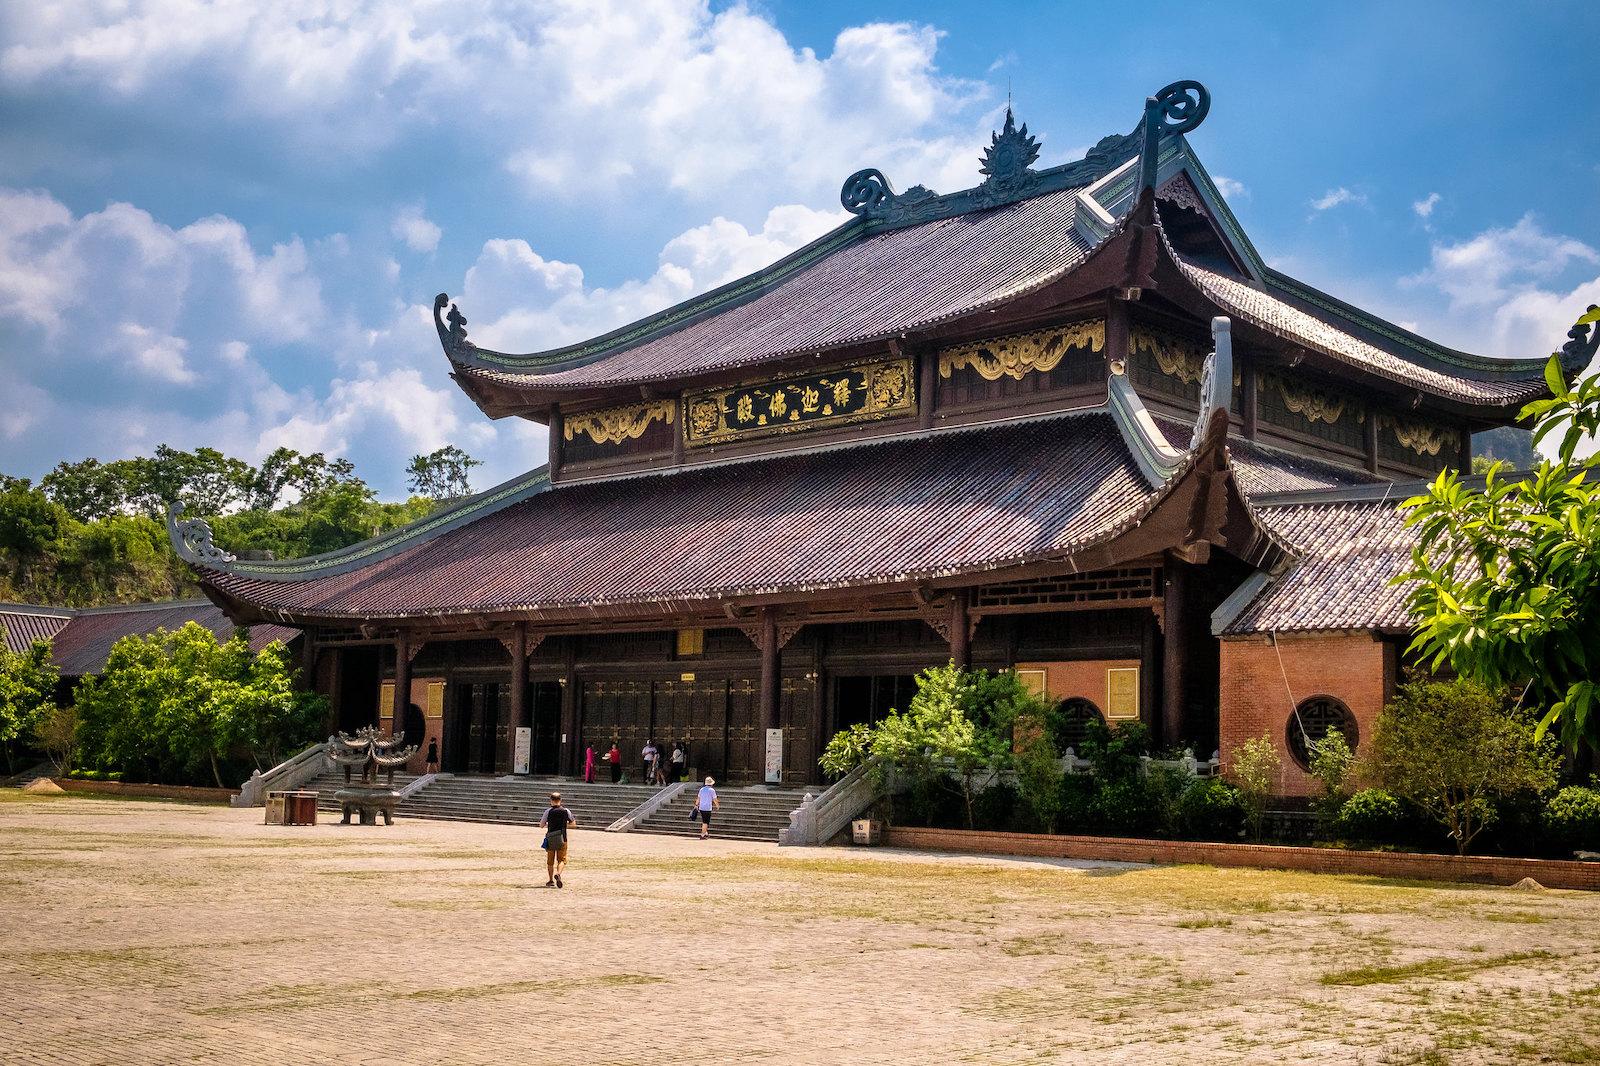 Bai Dinh Pagoda - Ninh Binh Province